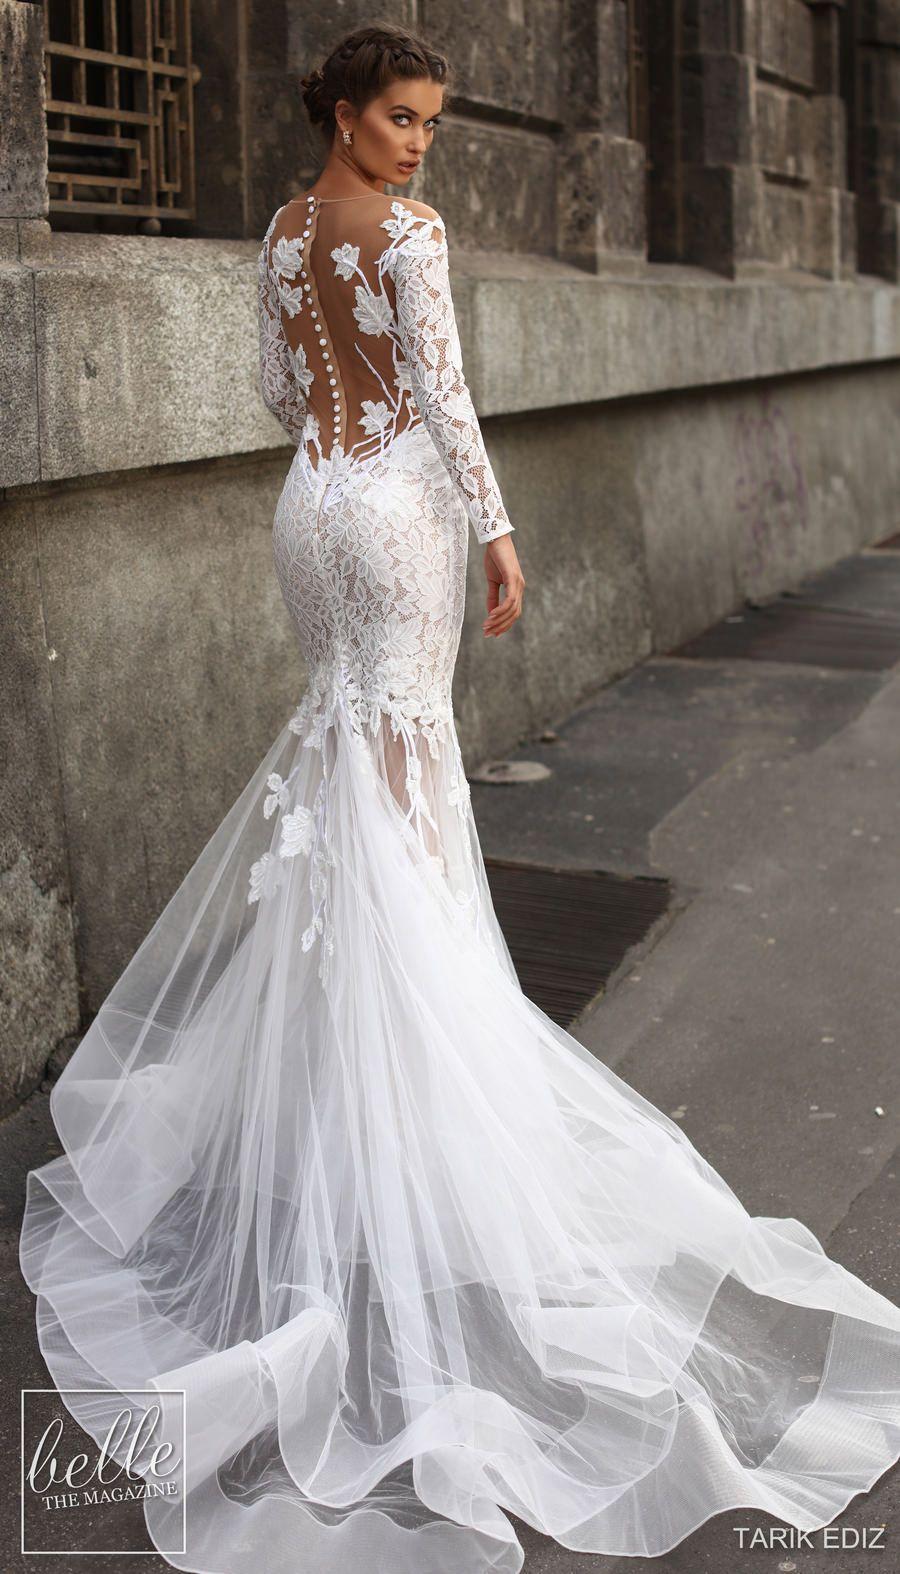 Tarik Ediz Wedding Dresses 2019 Belle The Magazine Wedding Dresses Plain Wedding Dress Beach Bridesmaid Dresses